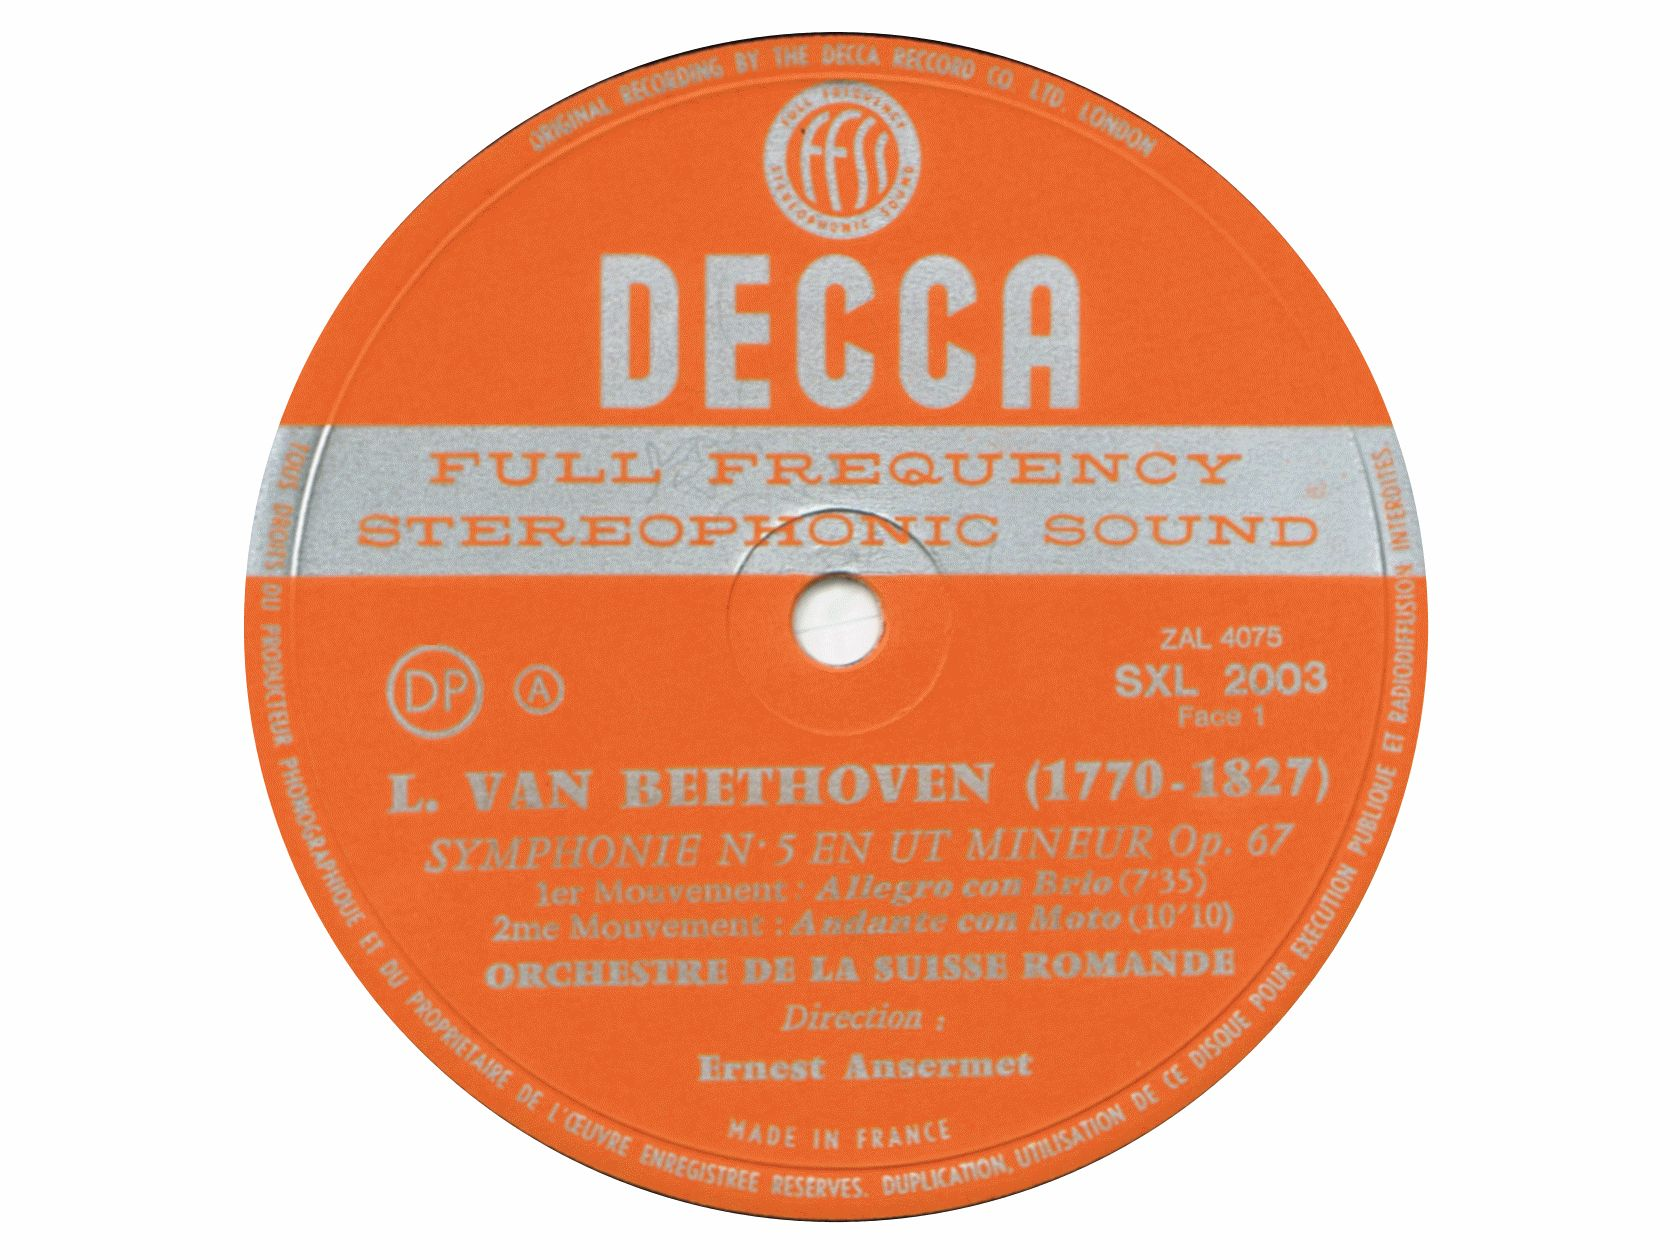 L. van Beethoven, Symphonie No 5, OSR, Ernest Ansermet, 1958 (disque)